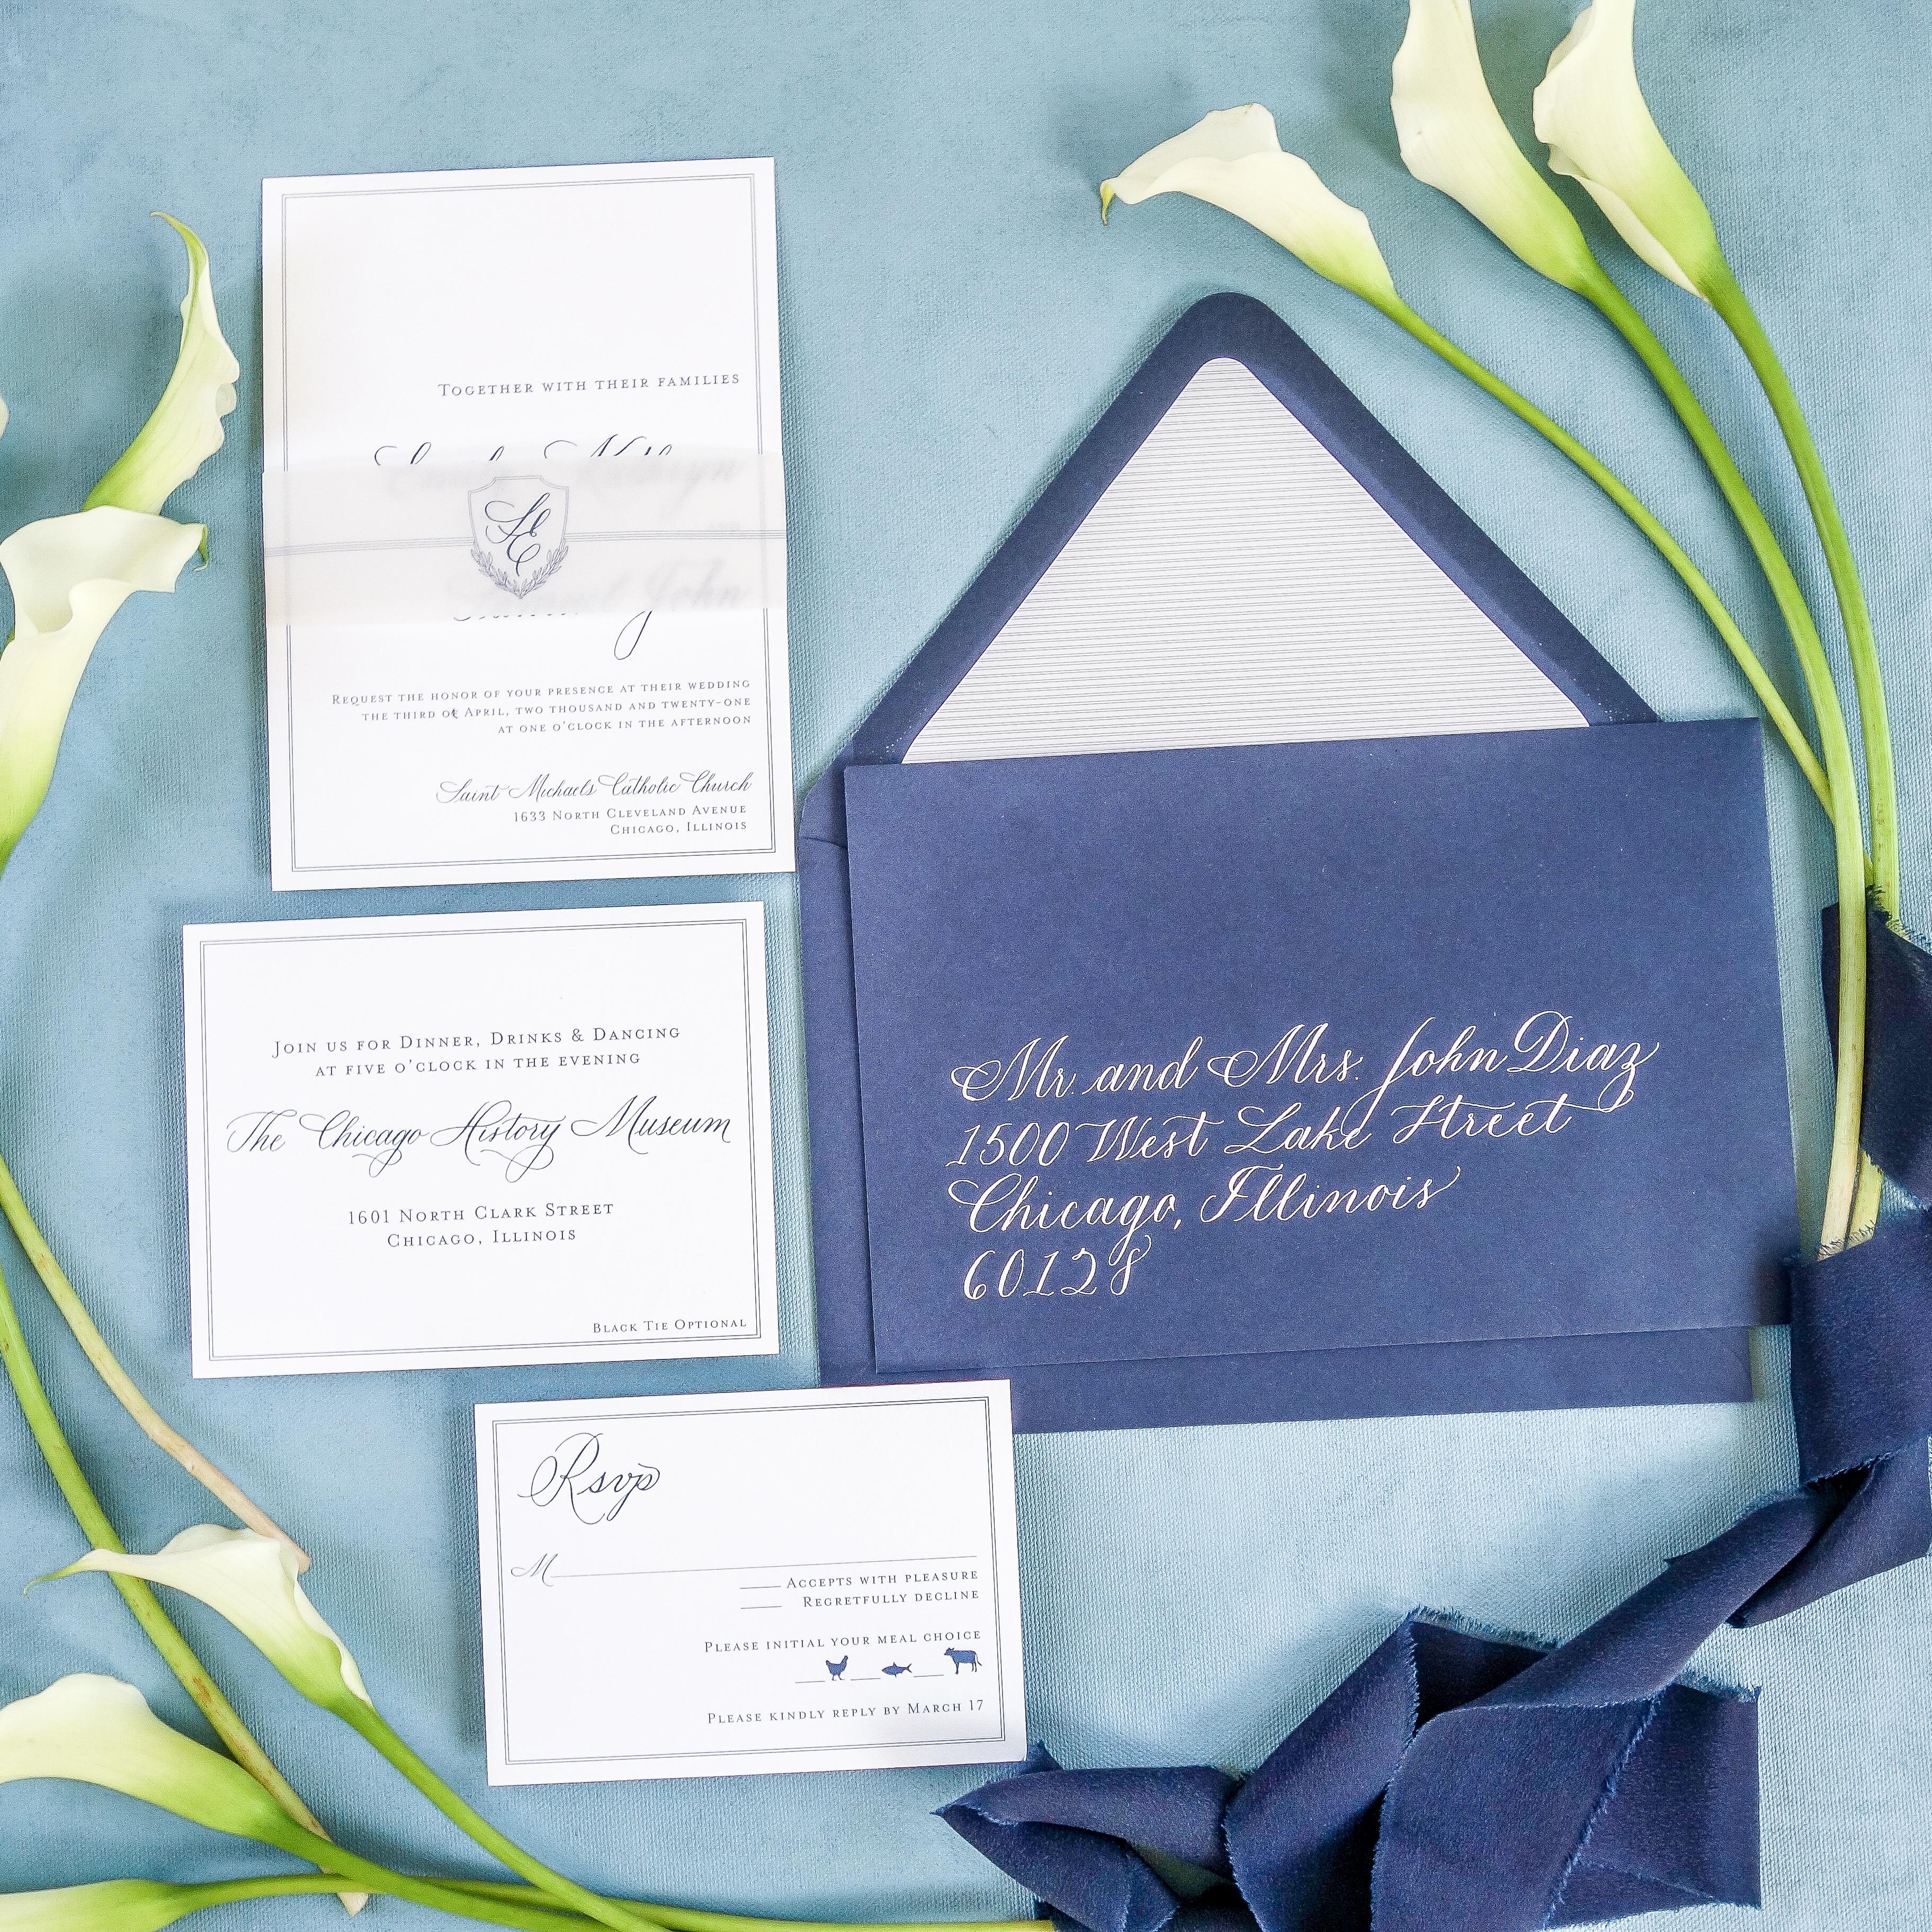 Chicago Calligrapher Chicago Wedding Invitations (4)